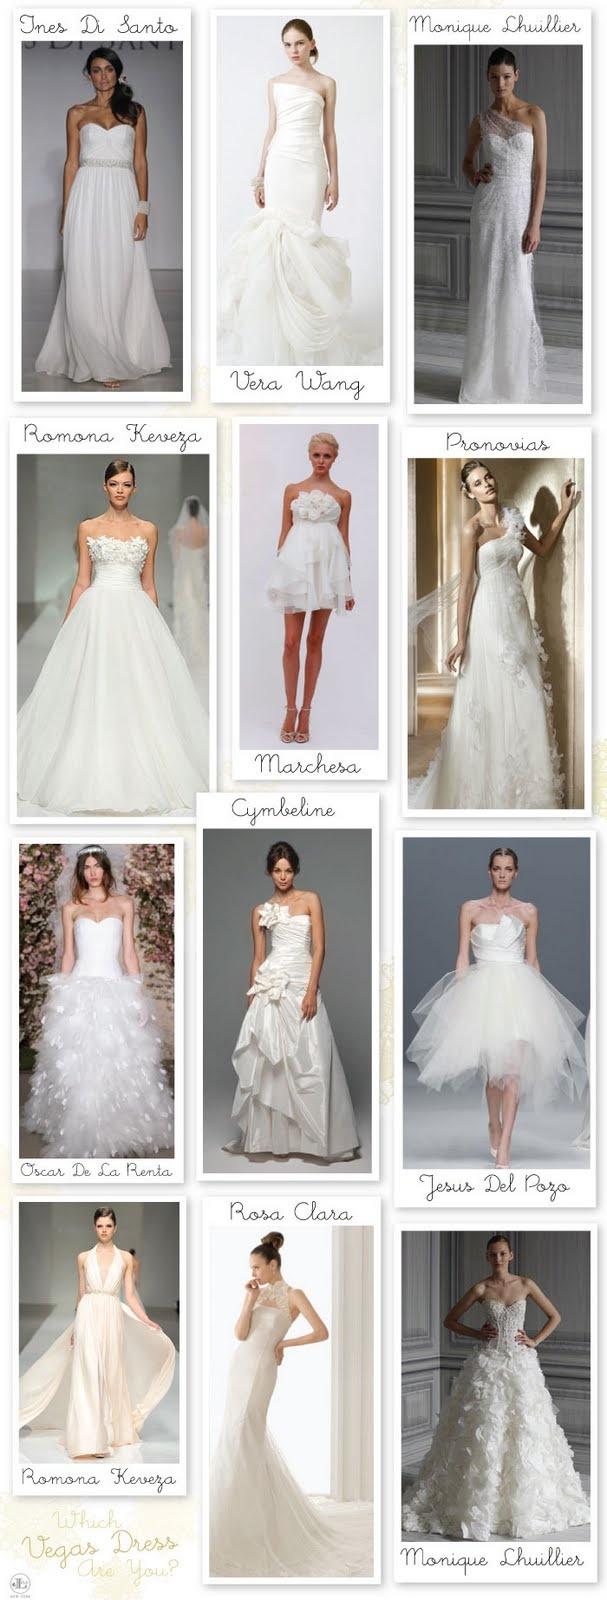 34 best viva las vegas images on pinterest las vegas for Las vegas wedding dress